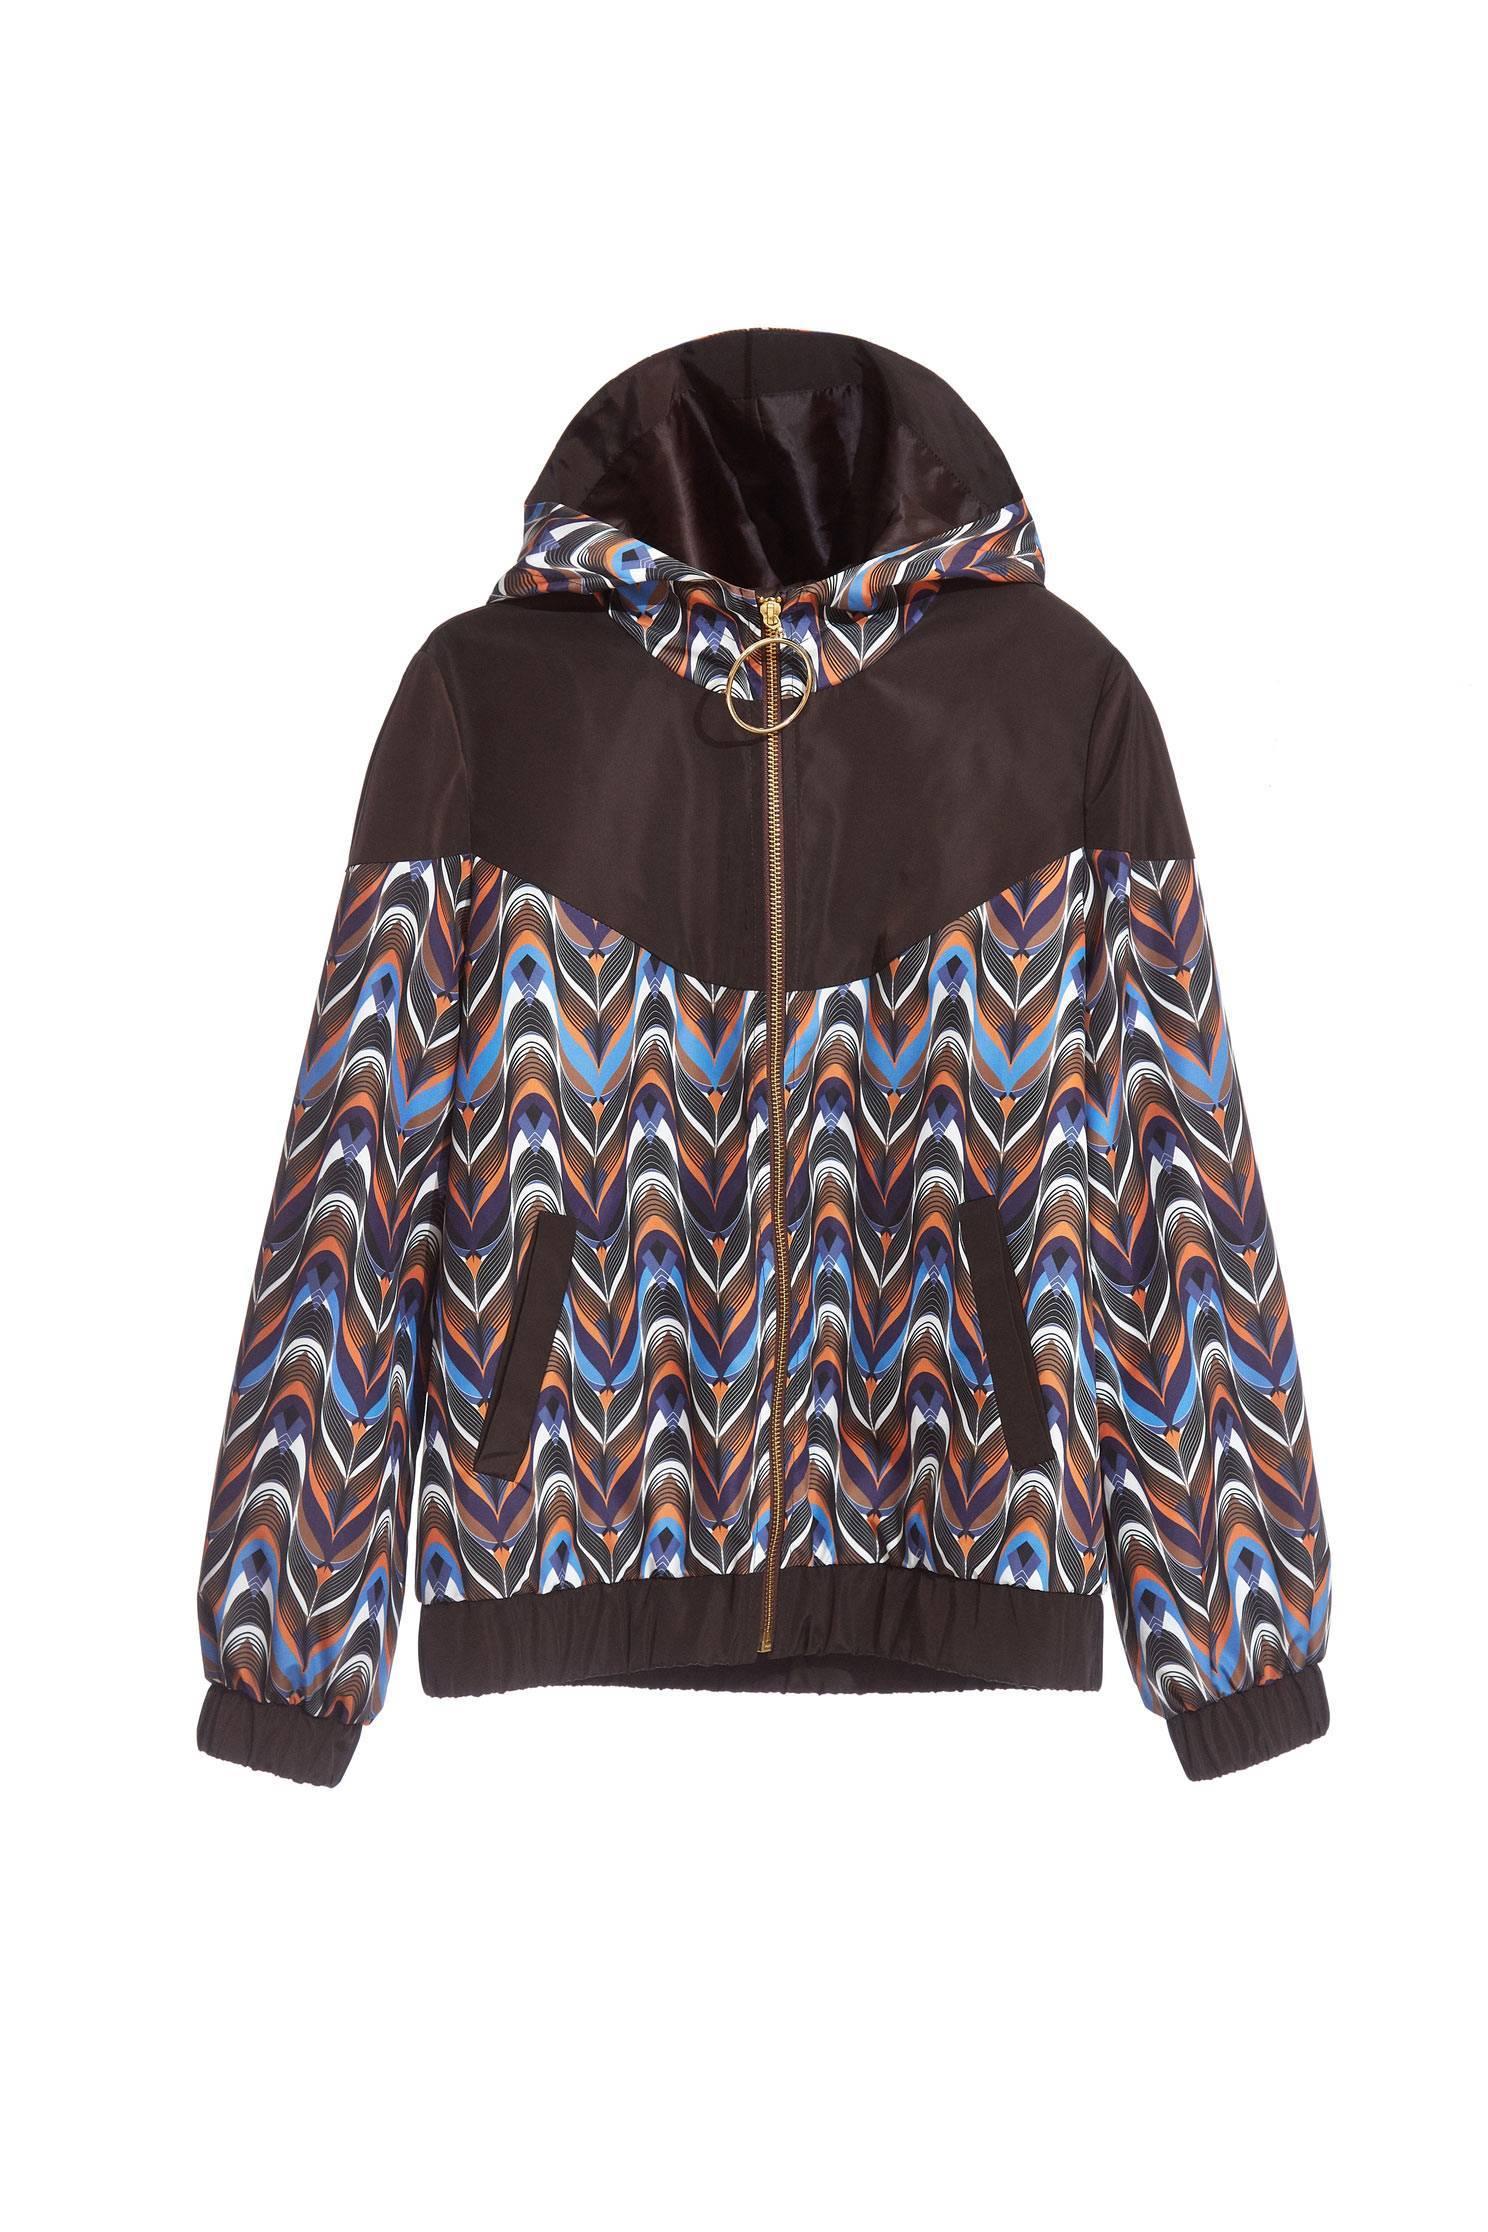 Stitching pattern popular design  jacket